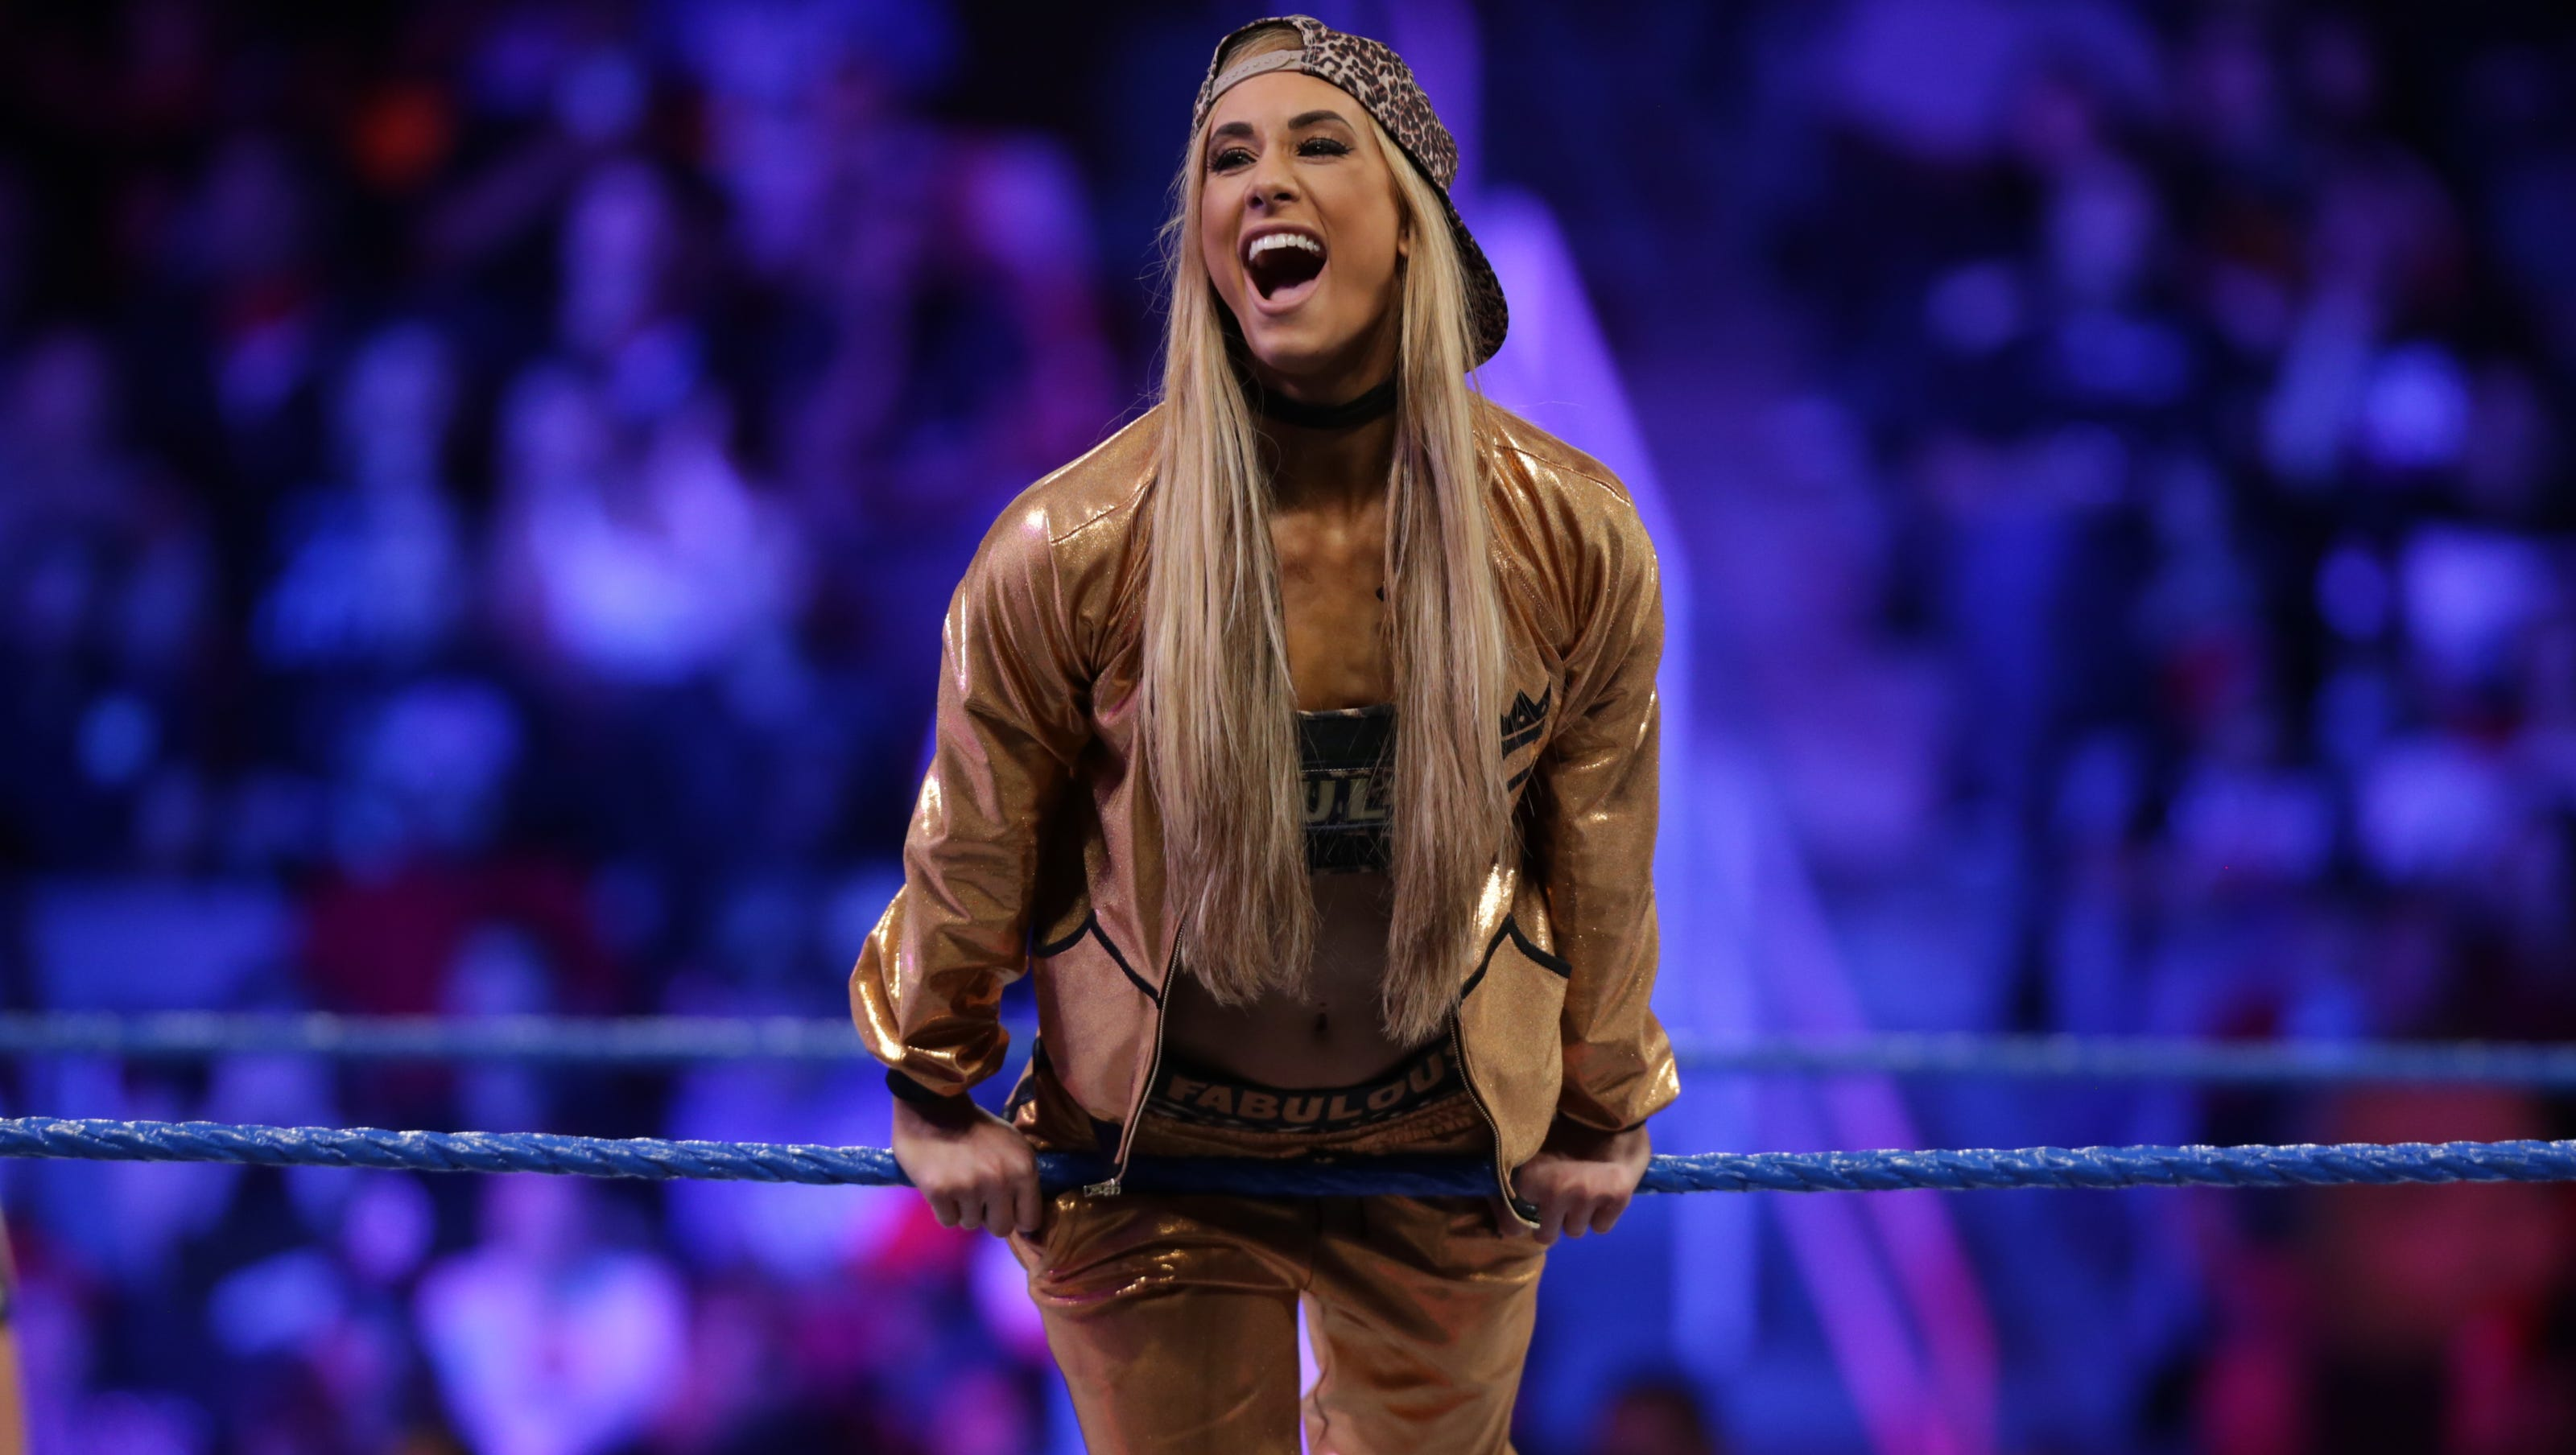 SmackDown's Carmella Part Of WWE's Next Gen